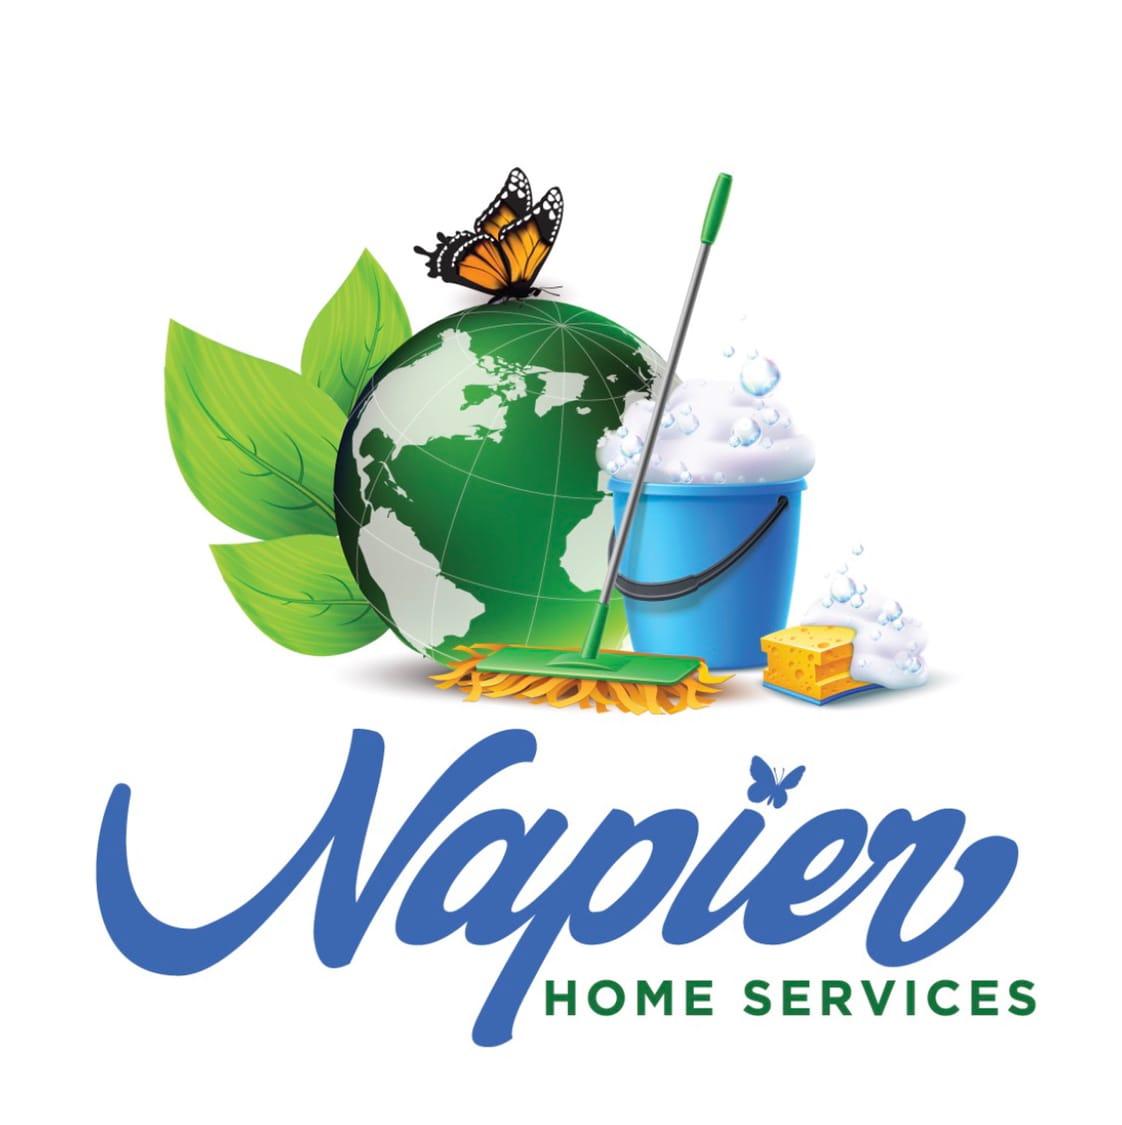 Napier's Home Services